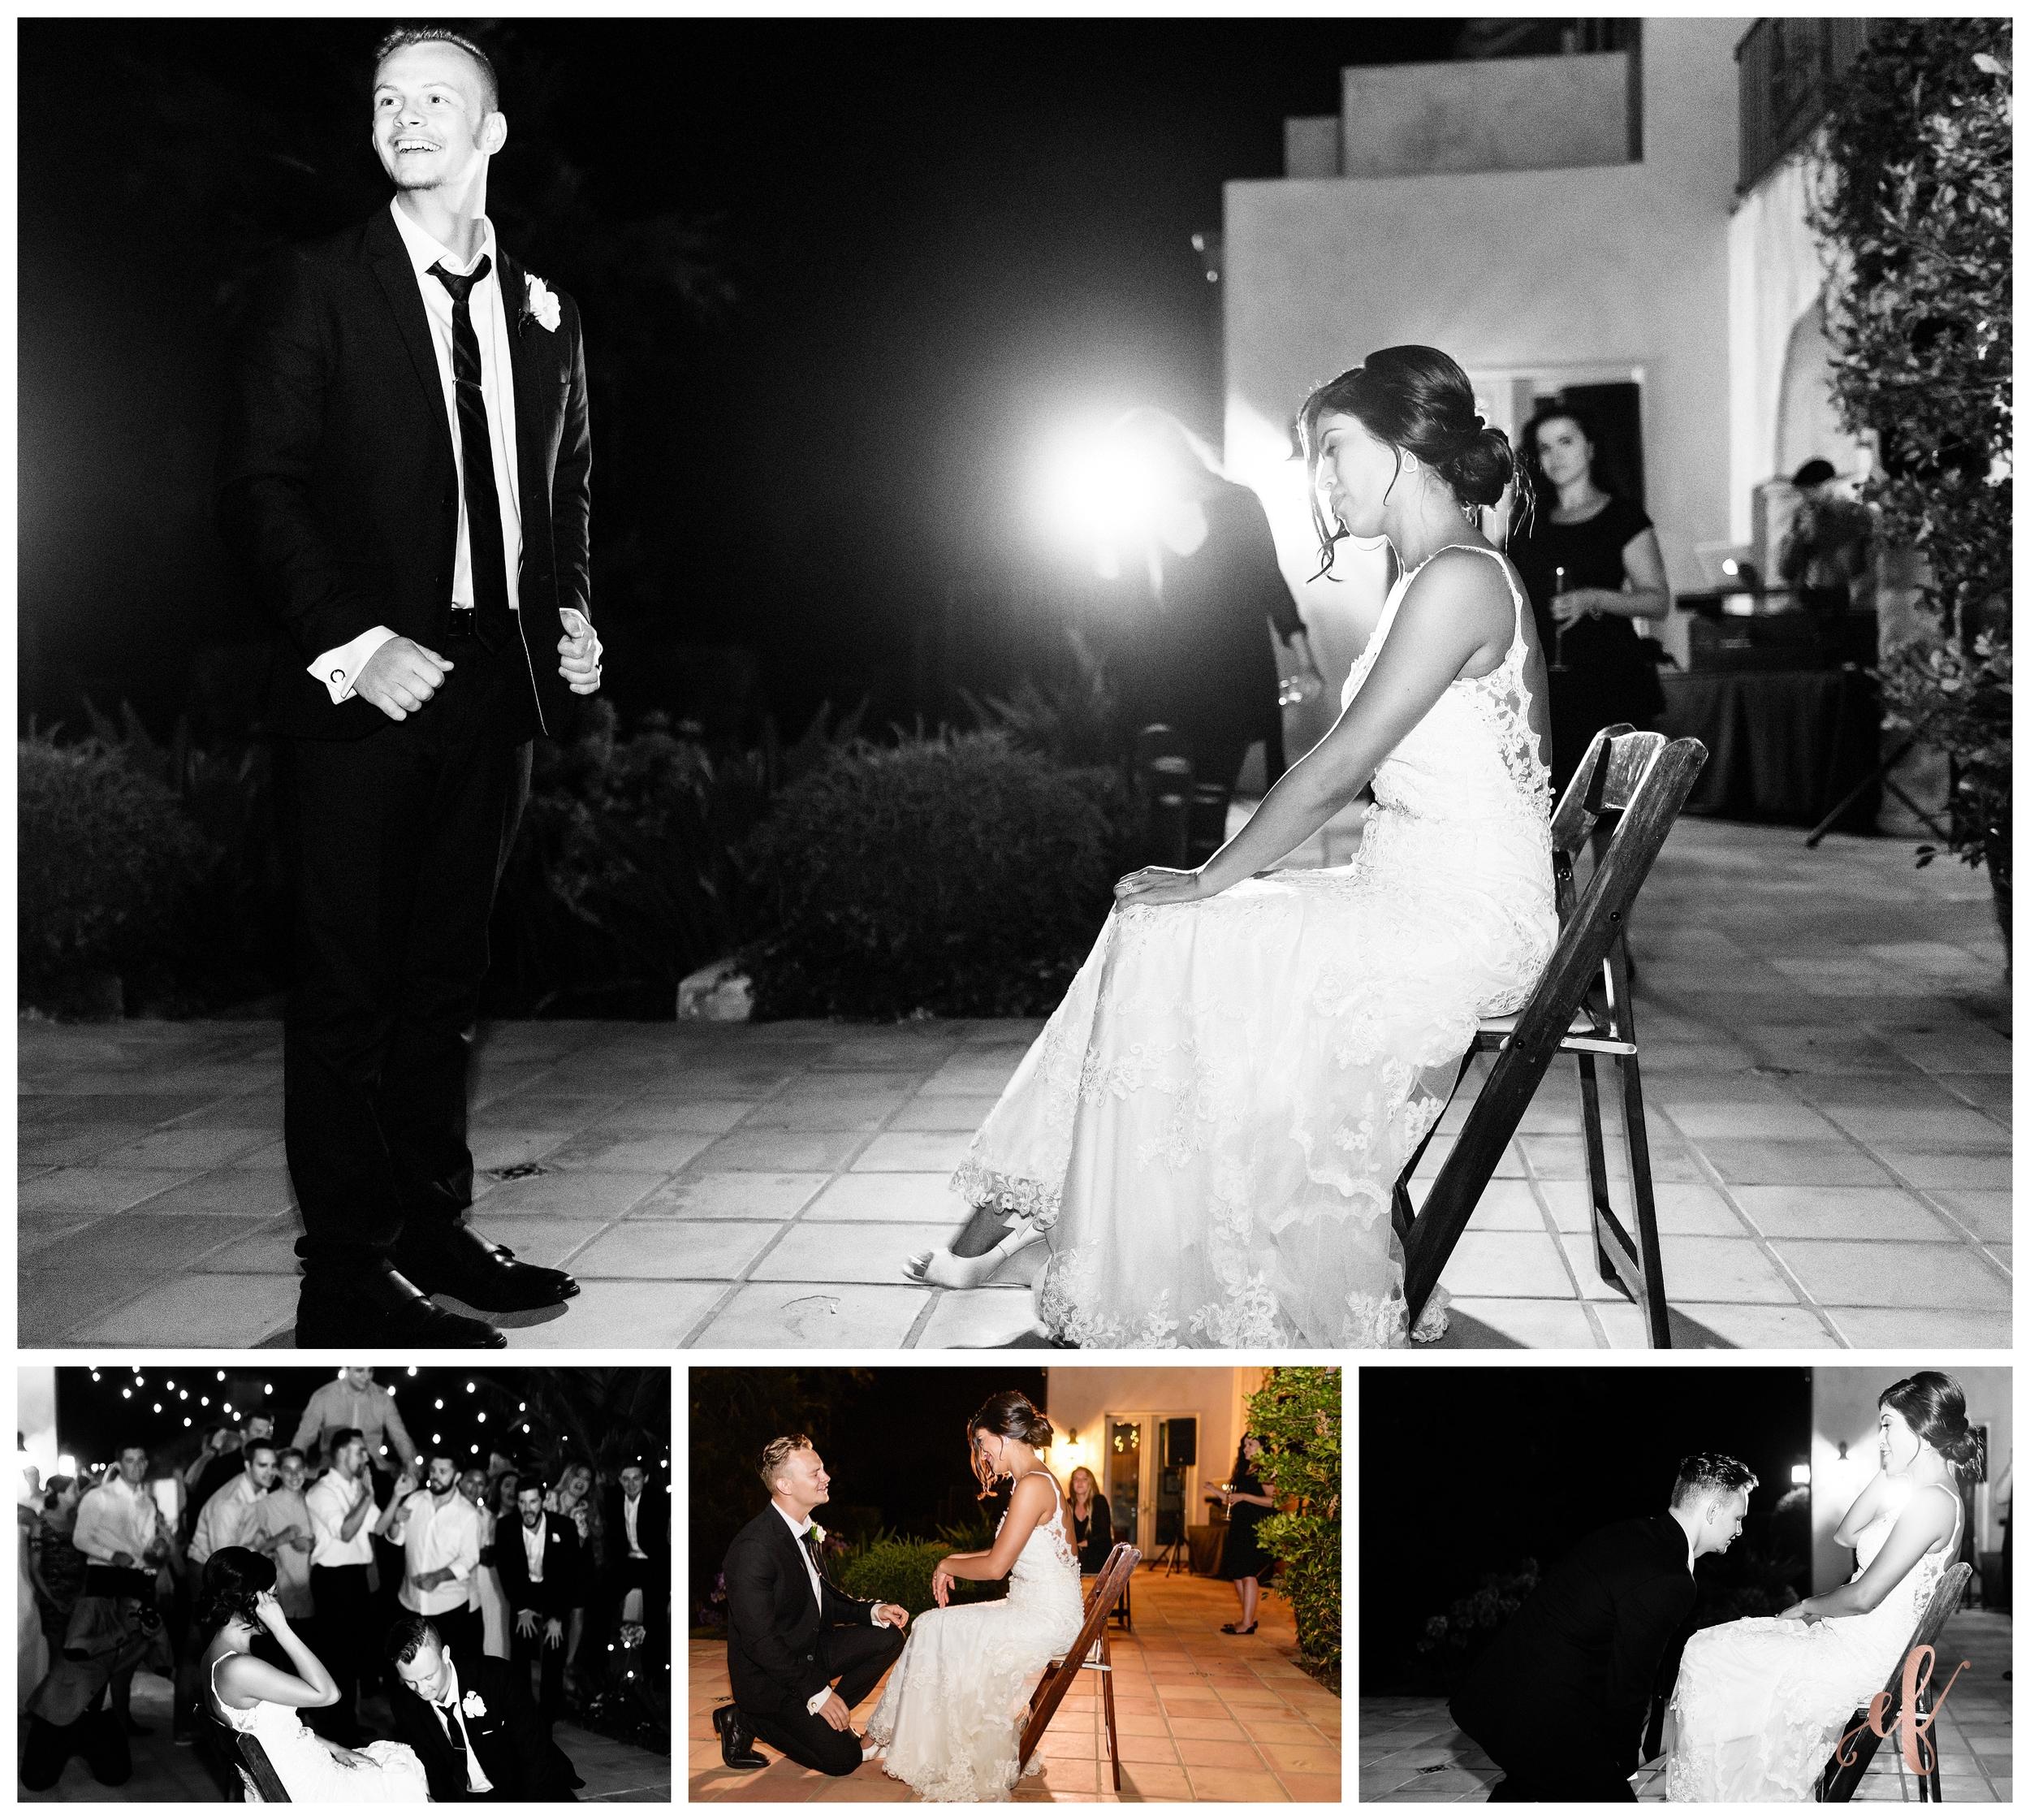 San Diego Wedding Photographer   Ernie & Fiona Photography   Bride   Groom   Garter